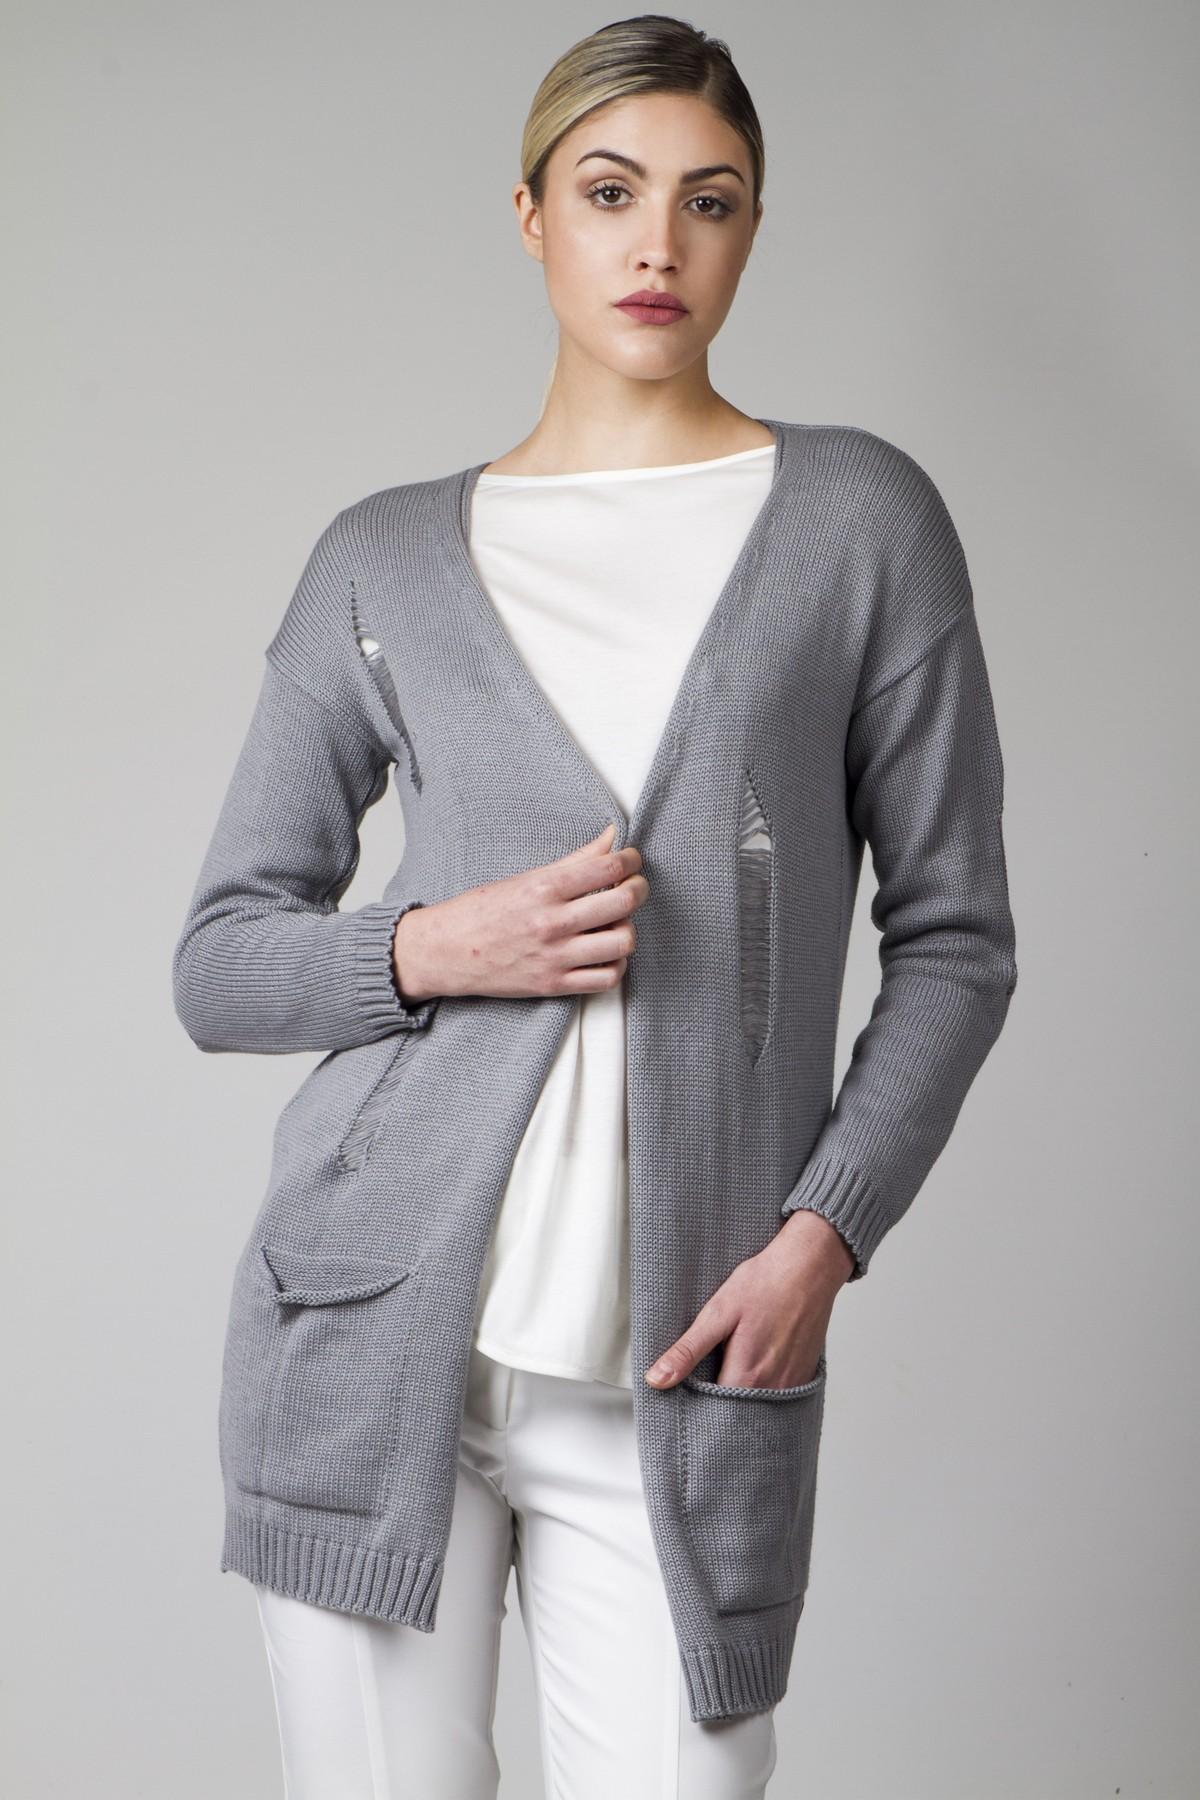 Short cardigan with rips in knitting - aggel.eu